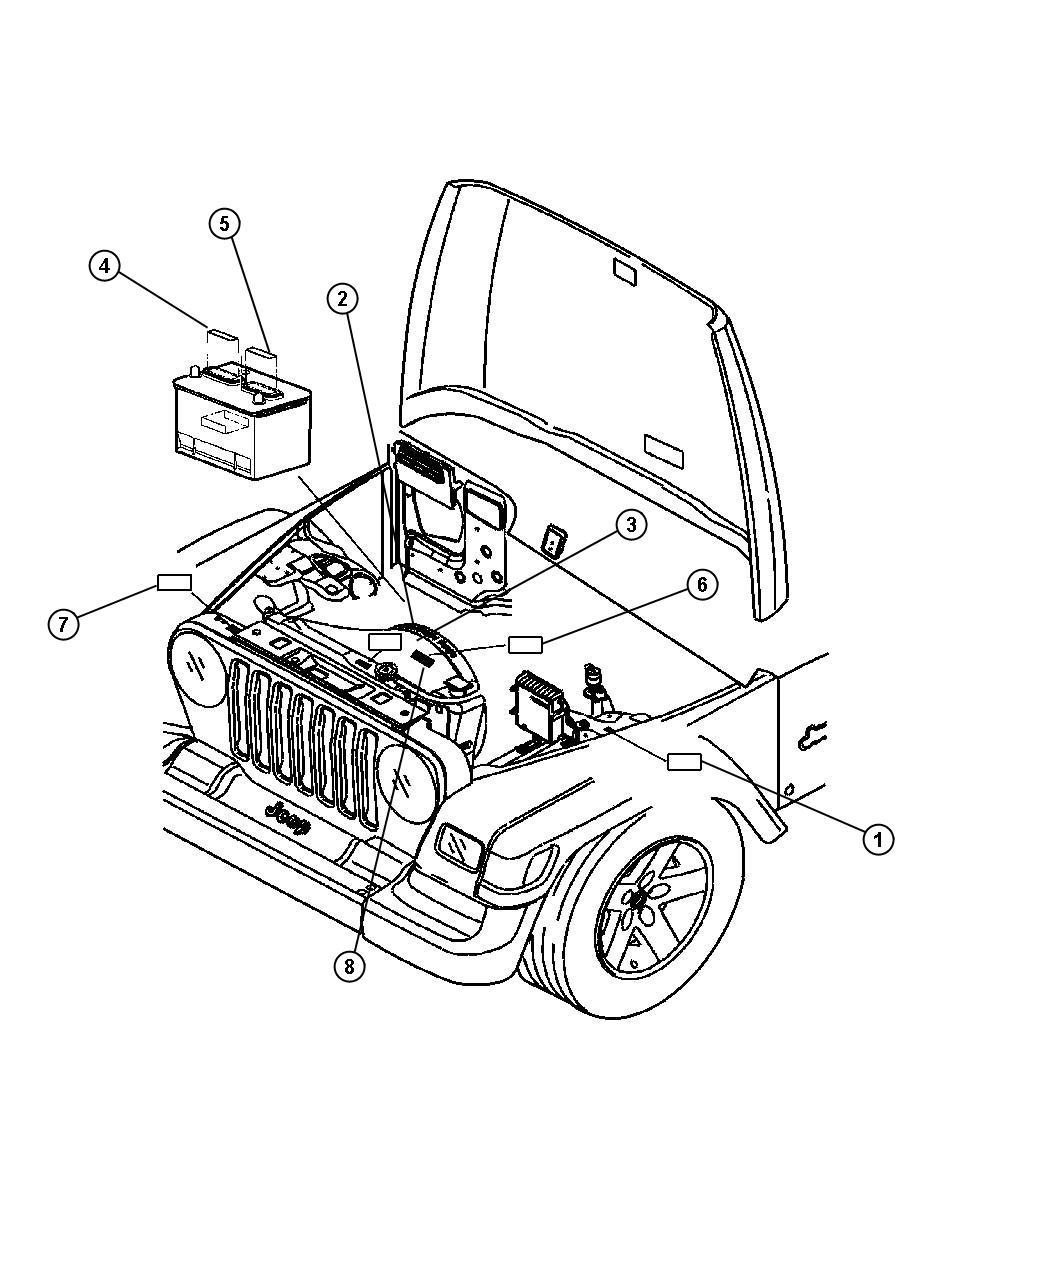 Jeep Wrangler Label Emission Naa